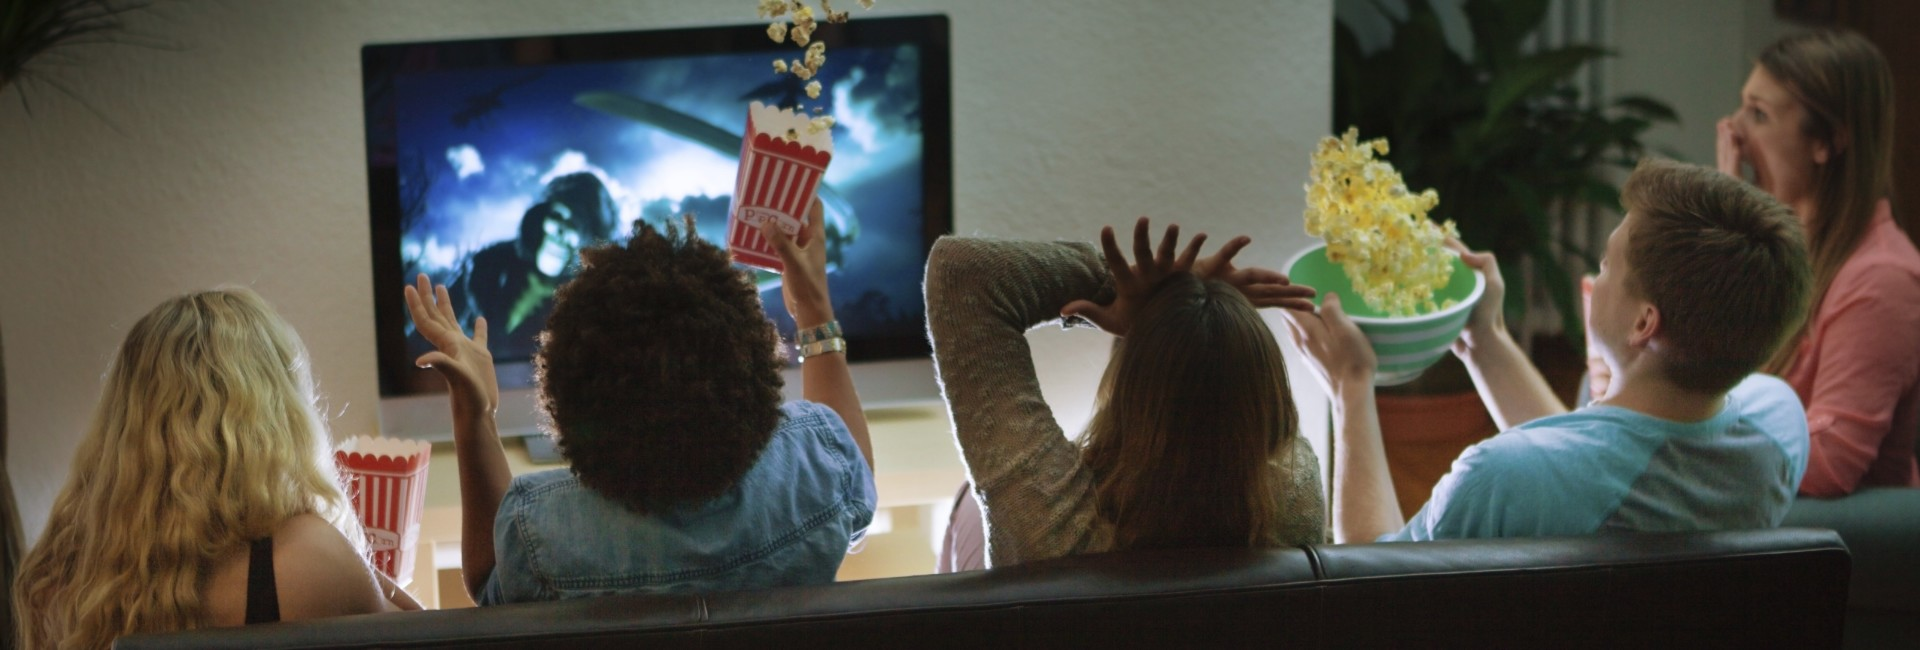 OTT video streaming oplossing voor film distributeurs